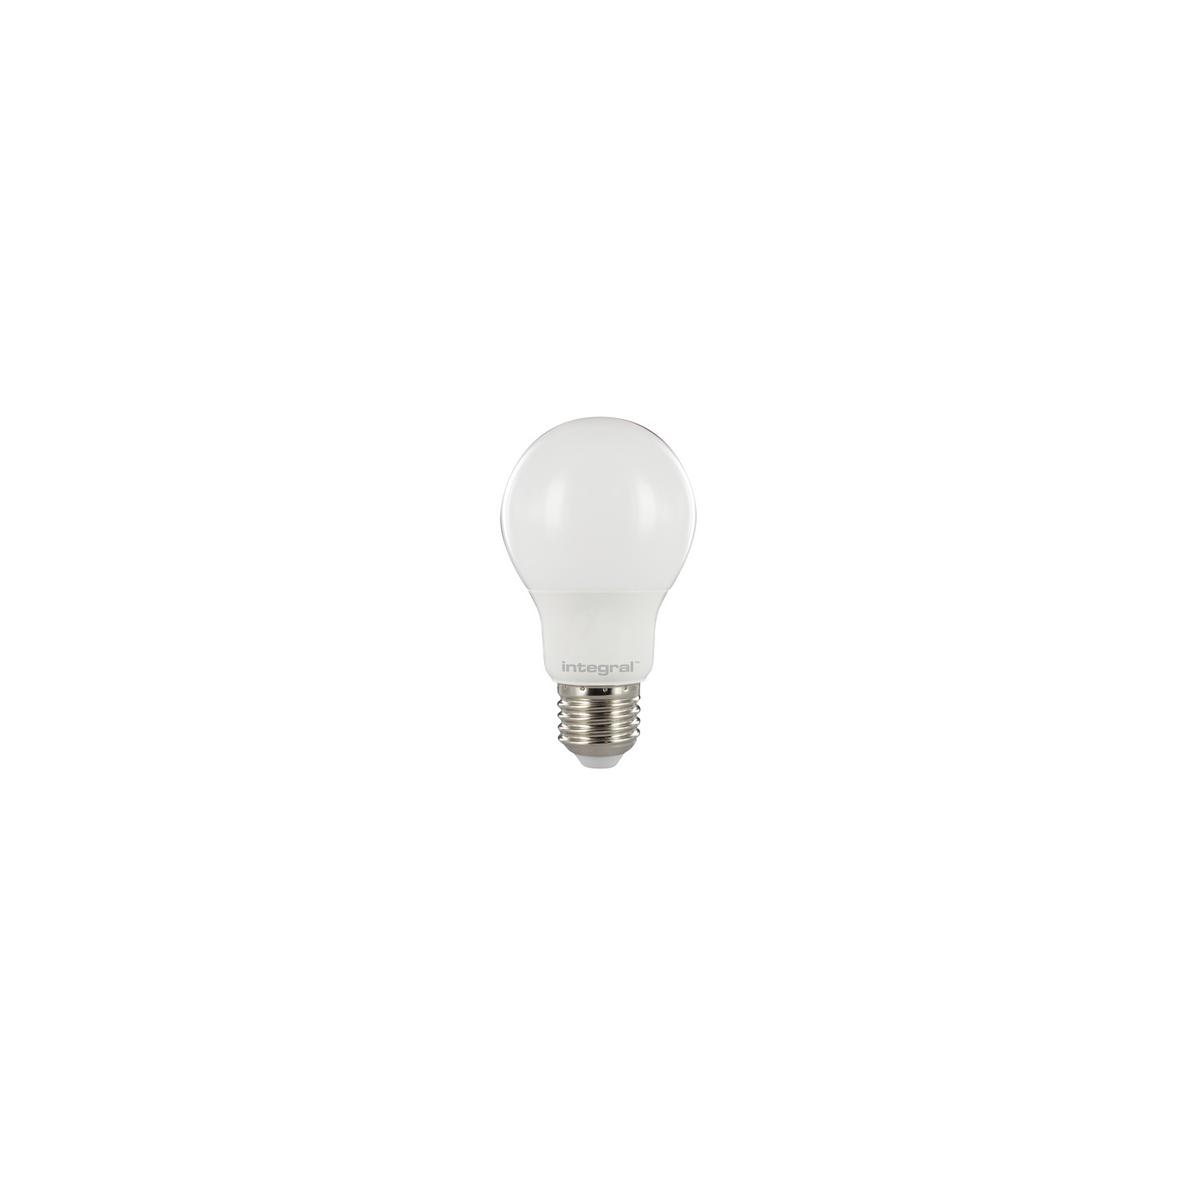 Integral LED E27 Classic globe 9.5W 2700K 806lm 15-66-74